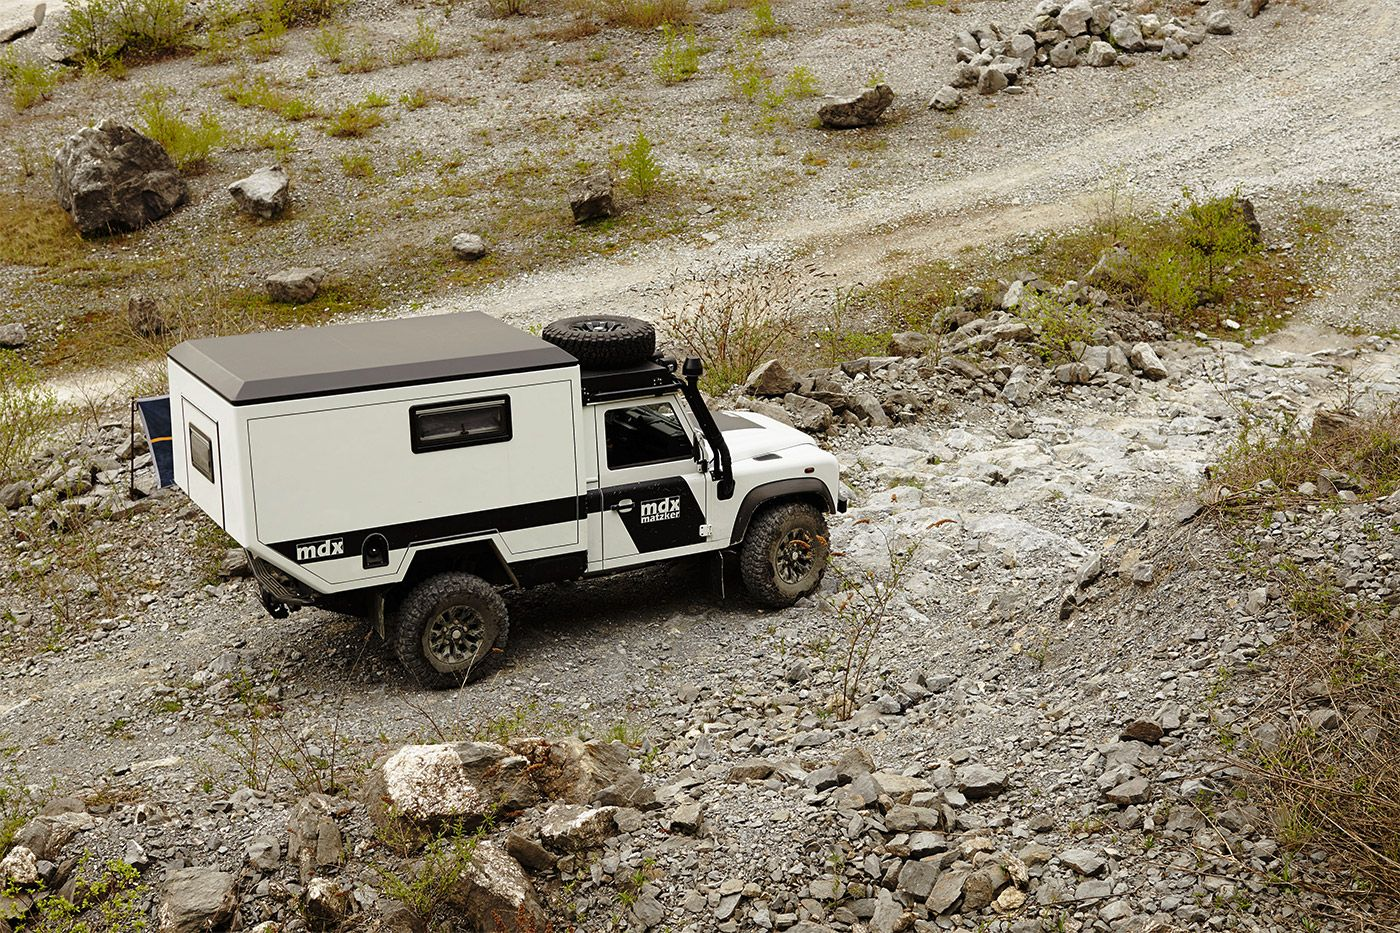 defender mdx das expeditionsfahrzeug reisemobil off road. Black Bedroom Furniture Sets. Home Design Ideas